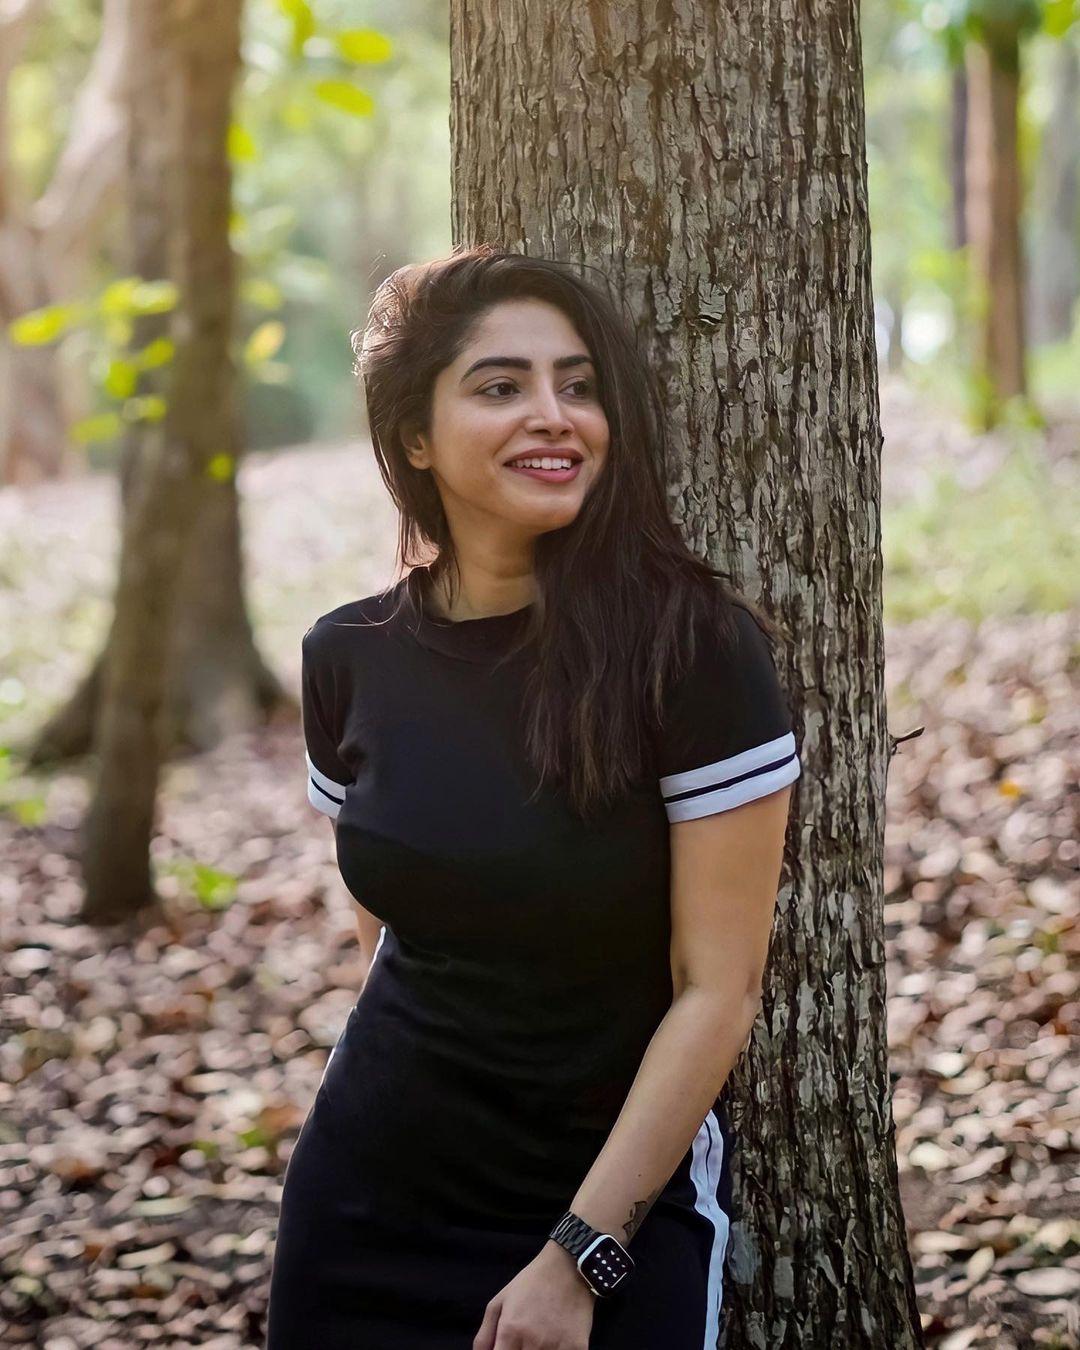 South Indian Actress Ameya Mathew Looking Hot in Black Dress